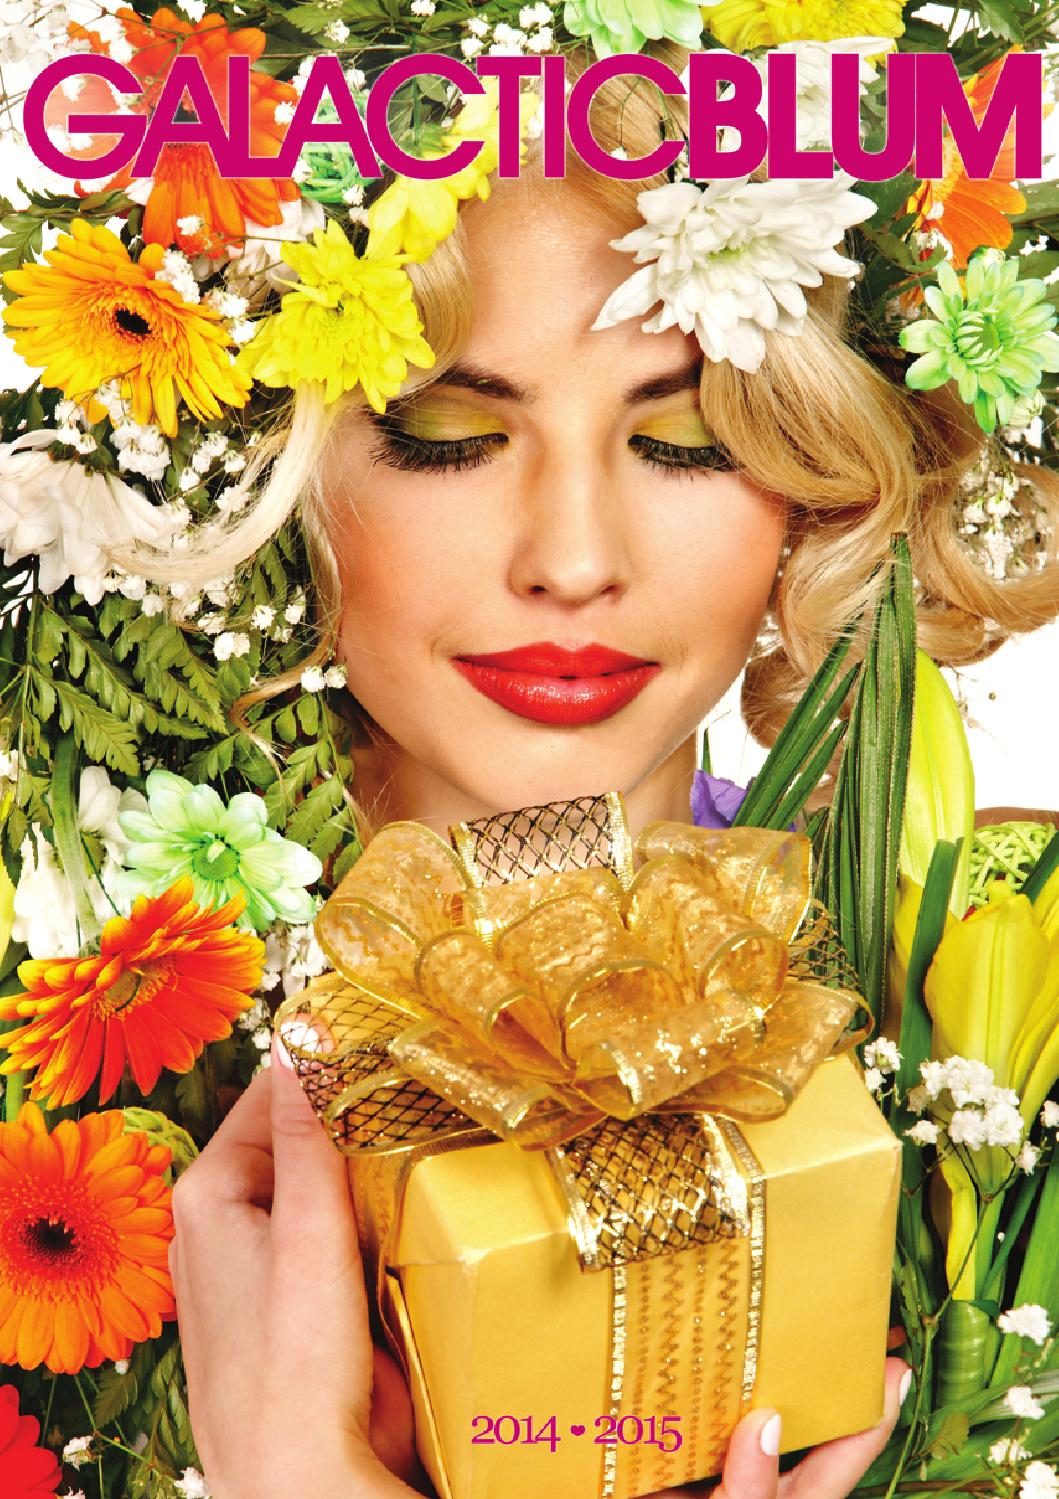 GALACTICBLUM EXCELLENT 20 unds. Caja De Esponjas Para Flor Natural